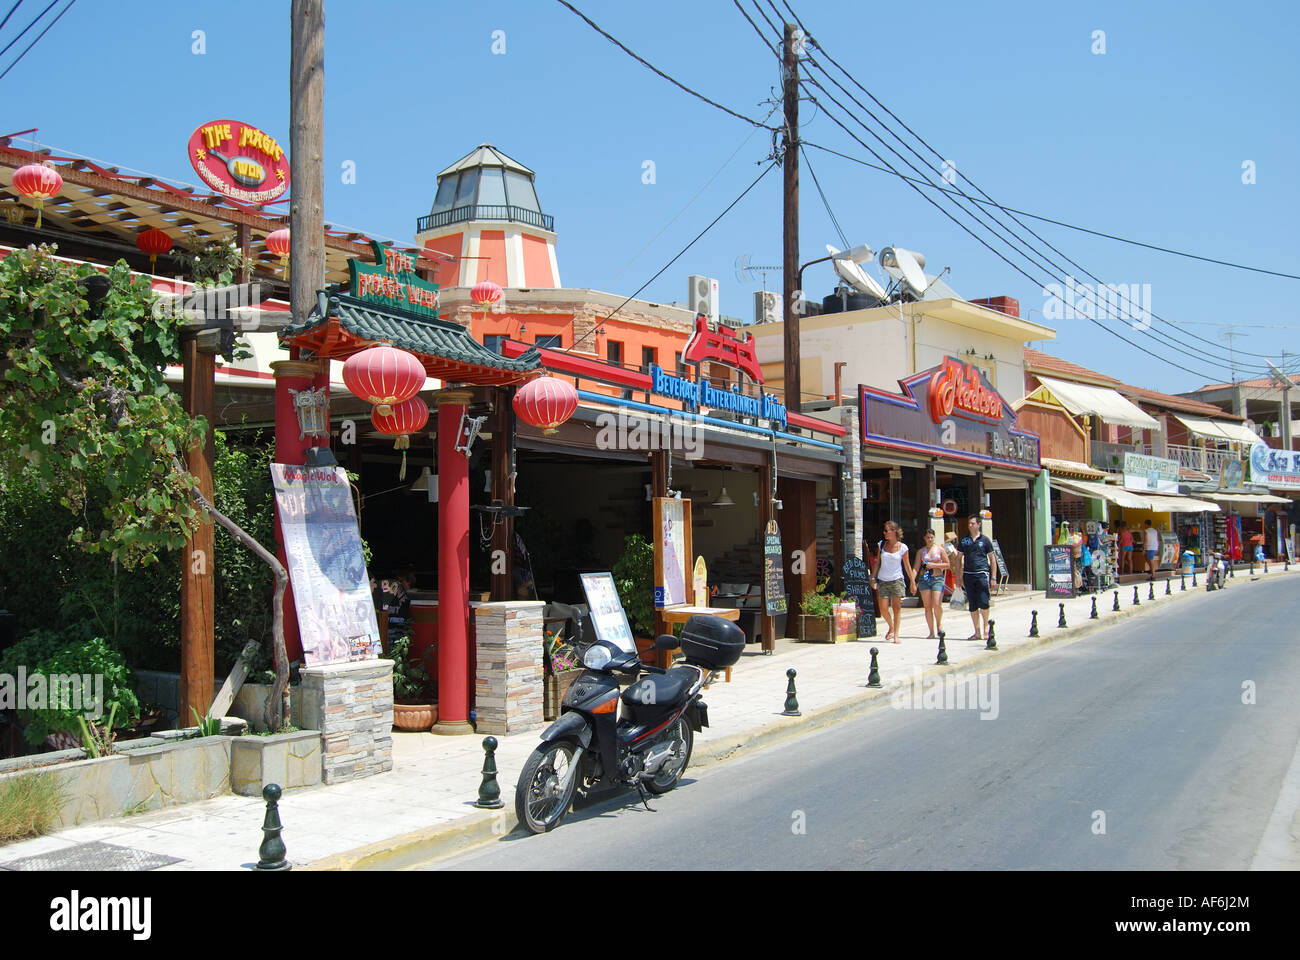 Tourist restaurants and bars, Street promenade, Sidari, Corfu, Ionian Islands, Greece - Stock Image